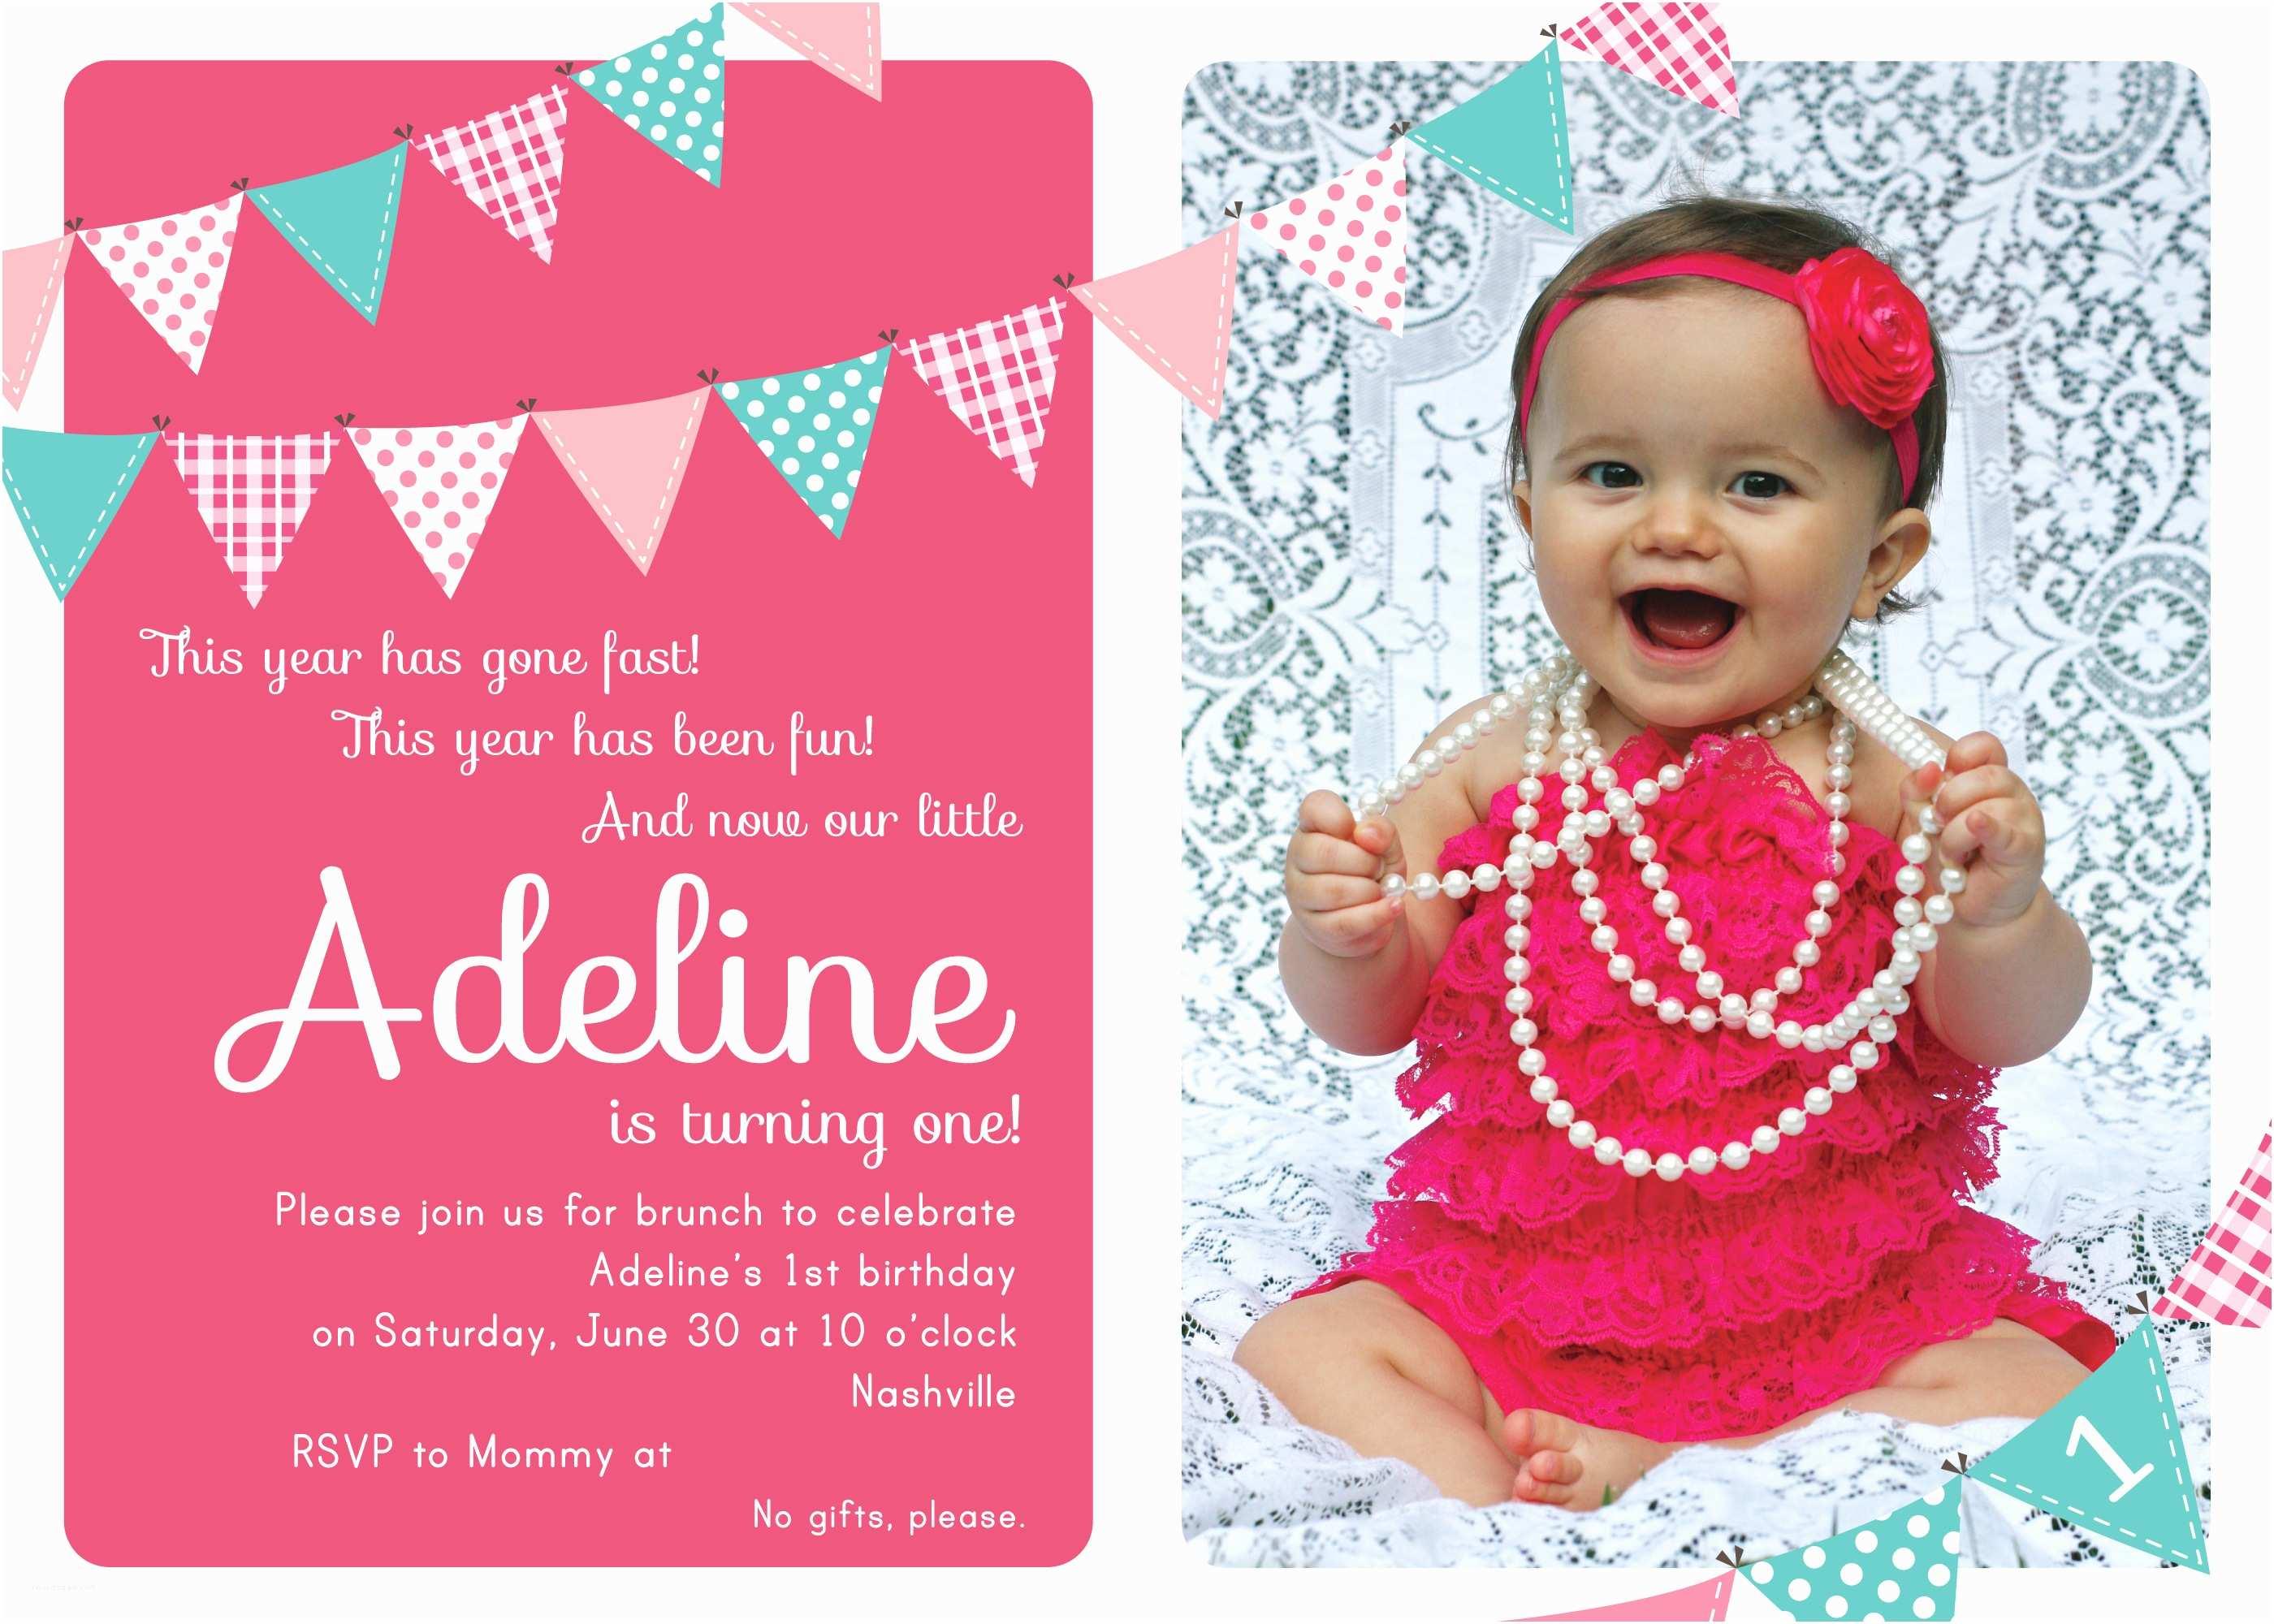 Girl Birthday Invitations Baby Girl's 1st Birthday Invitation Cards Ideas